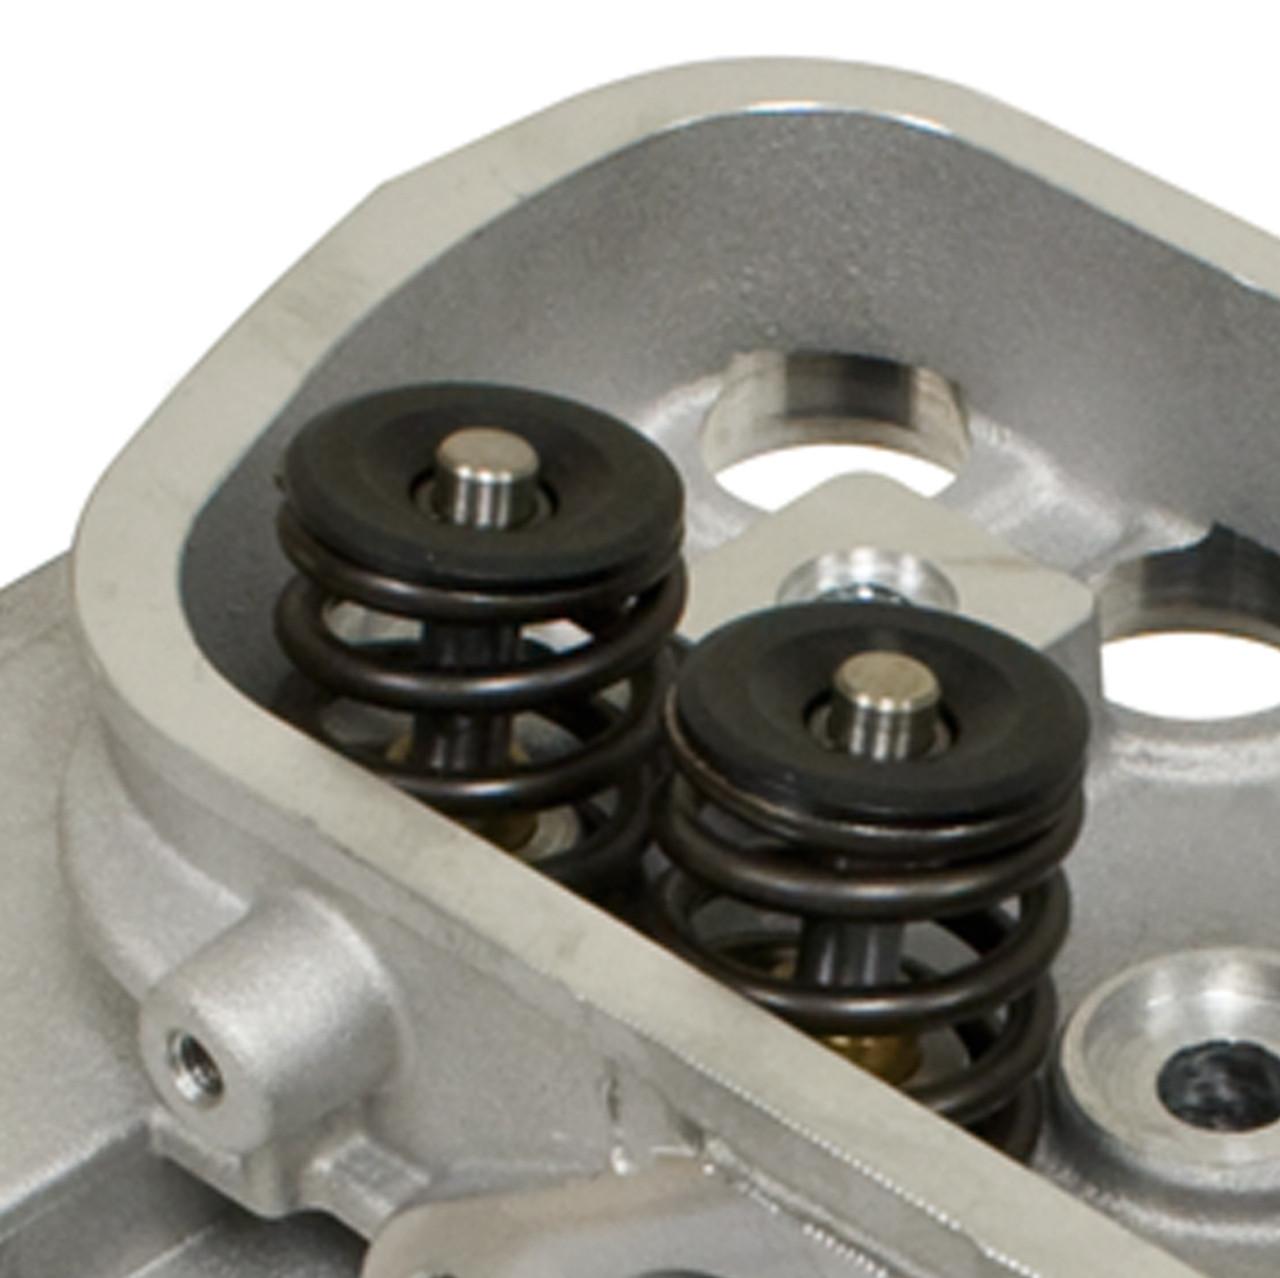 Empi 98-1439-B Racing Cylinder Head Vw Bug 42 X 37.5 SS Valves 94 Bore